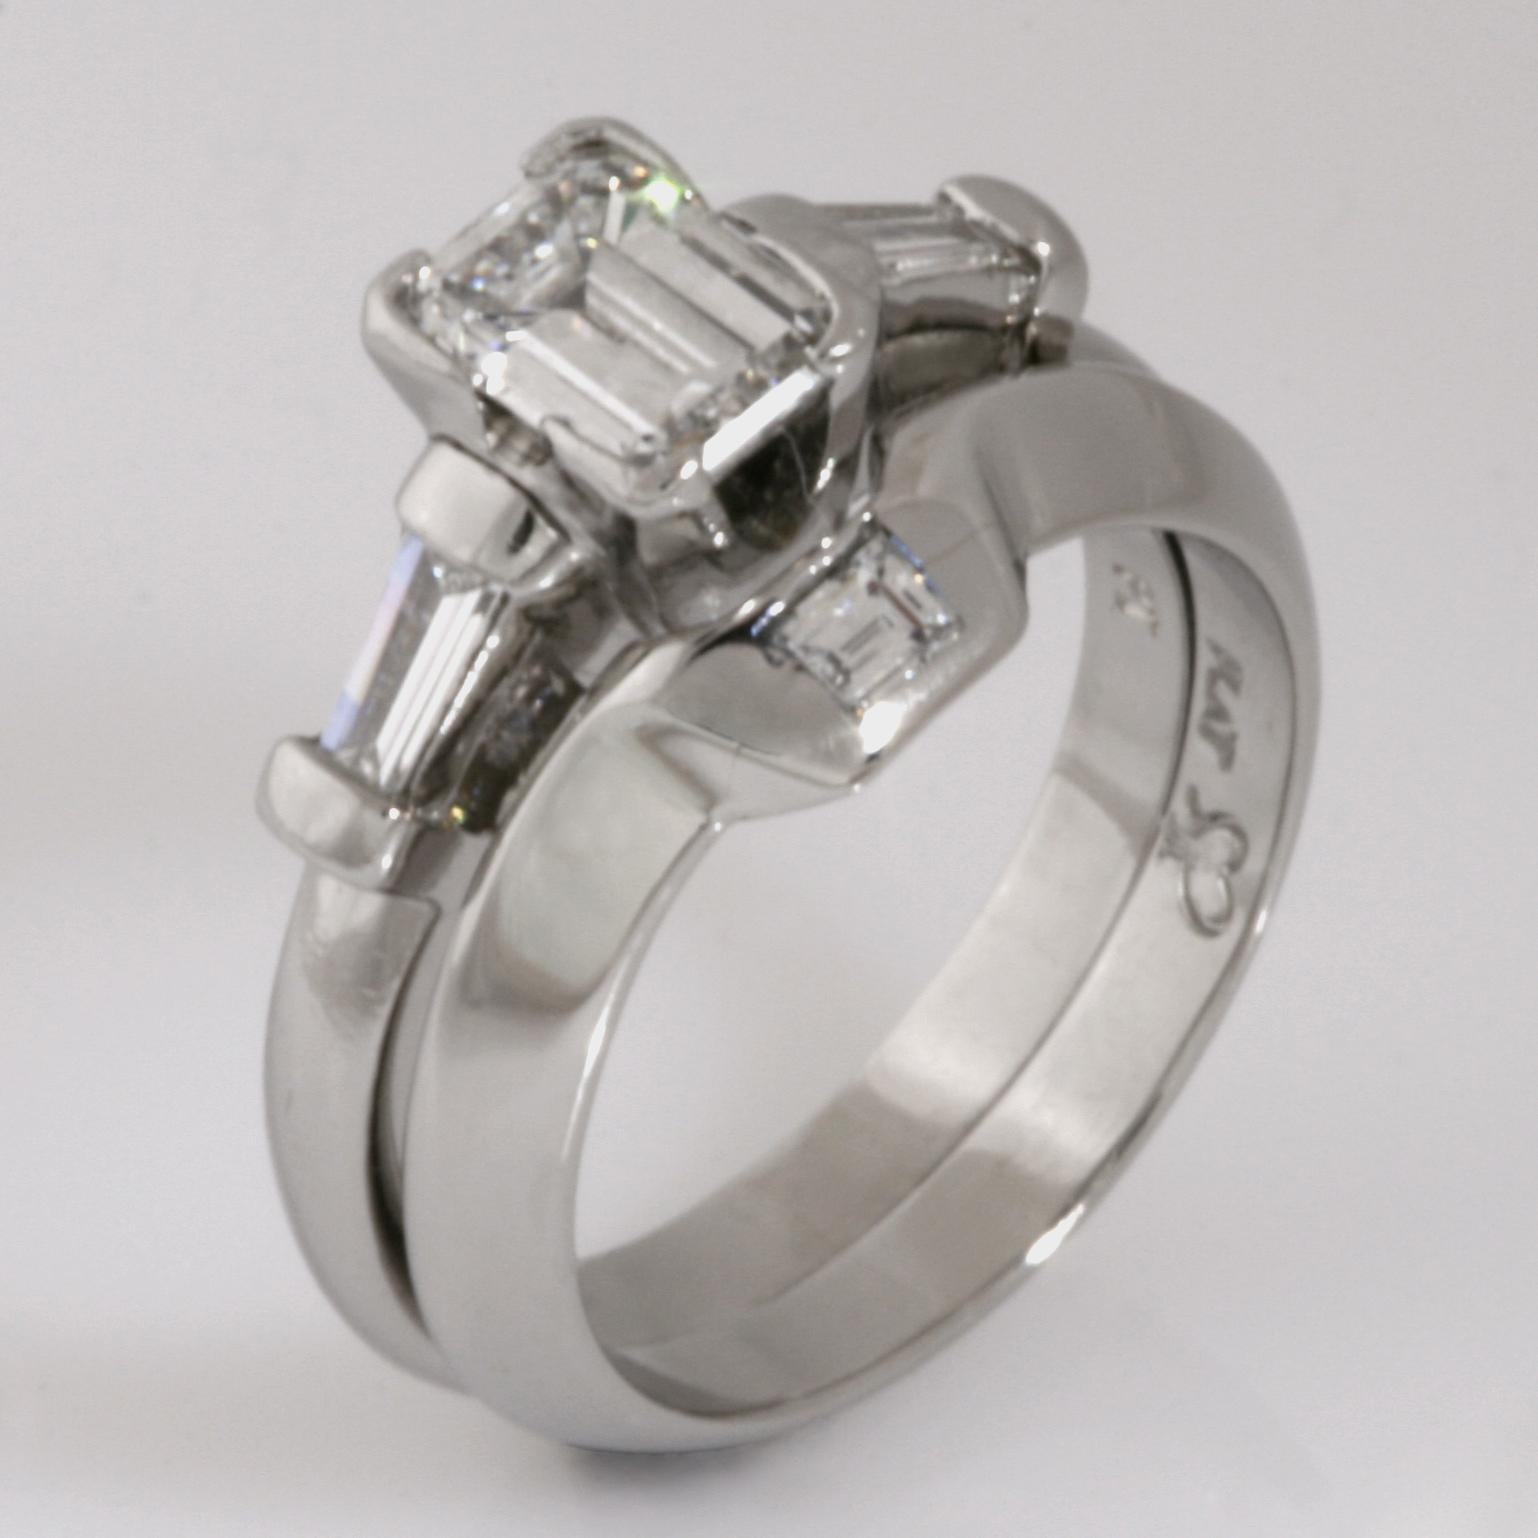 Handmade ladies platinum baguette diamond wedding ring